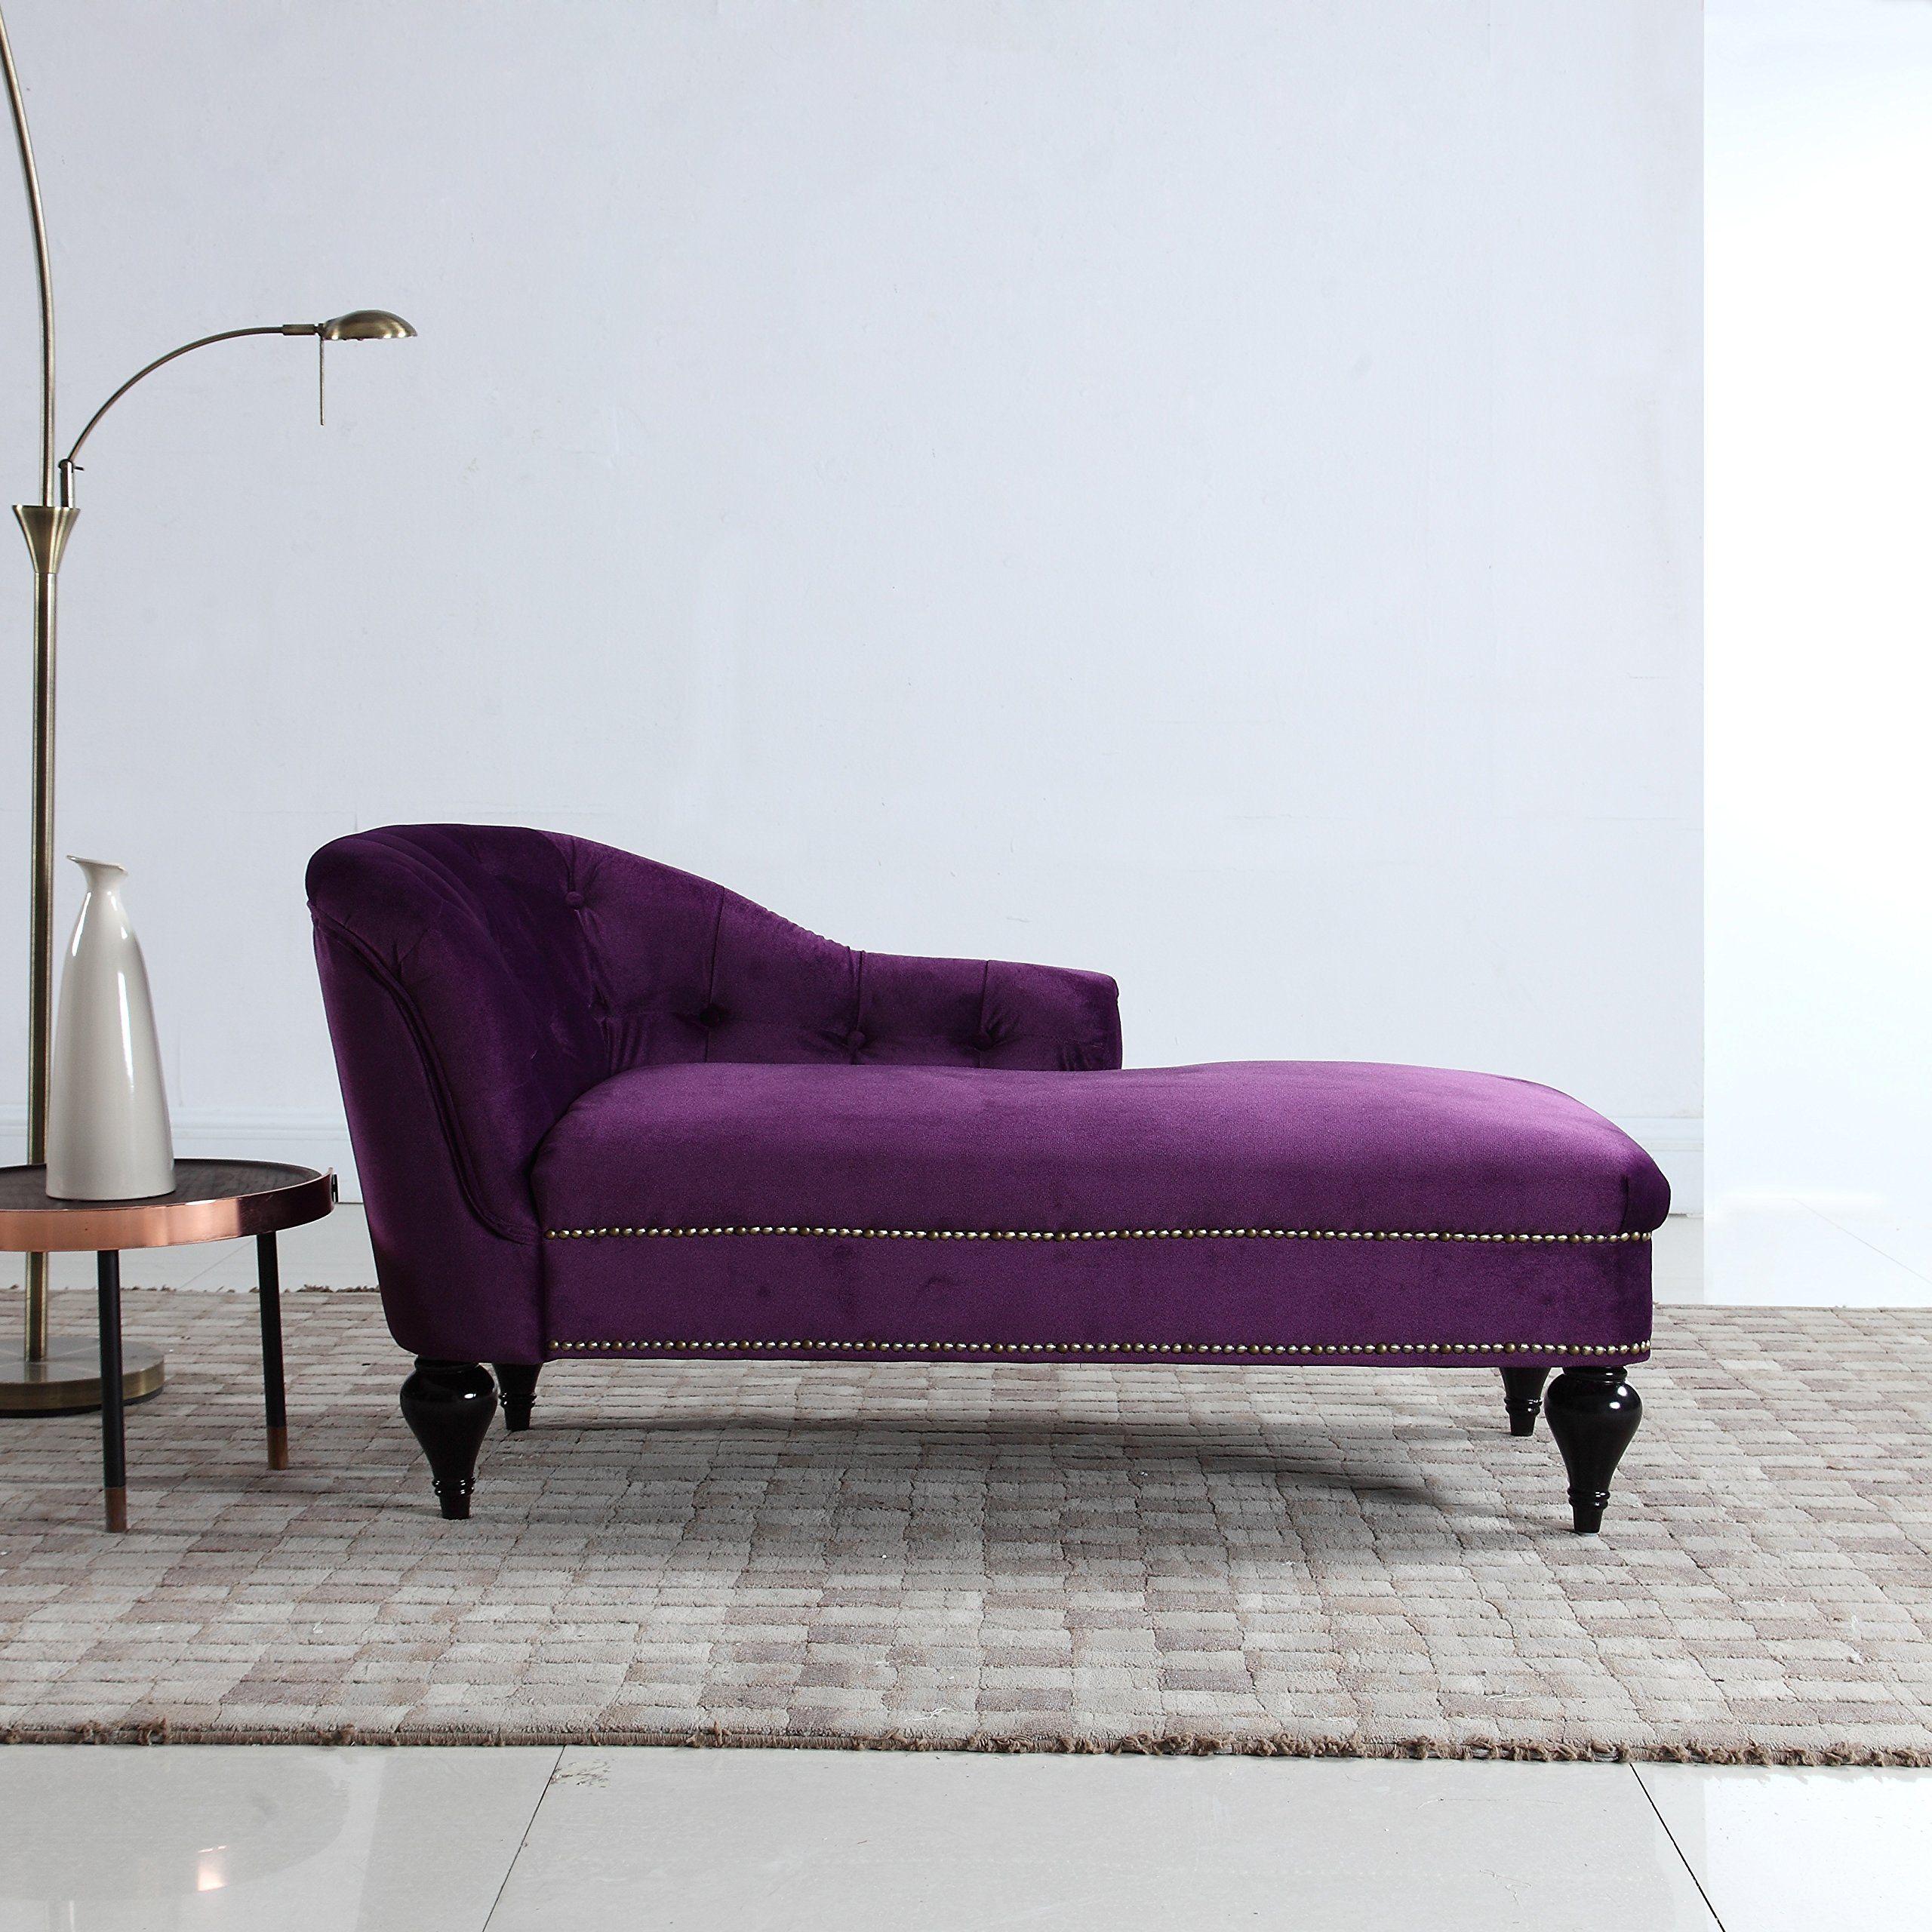 Divano Roma Furniture Modern And Elegant Kids Velvet Chaise Lounge For Living Room Or Bedroom Dark Purple Chaise Lounge Indoor Living Room Chaise Chaise Lounge